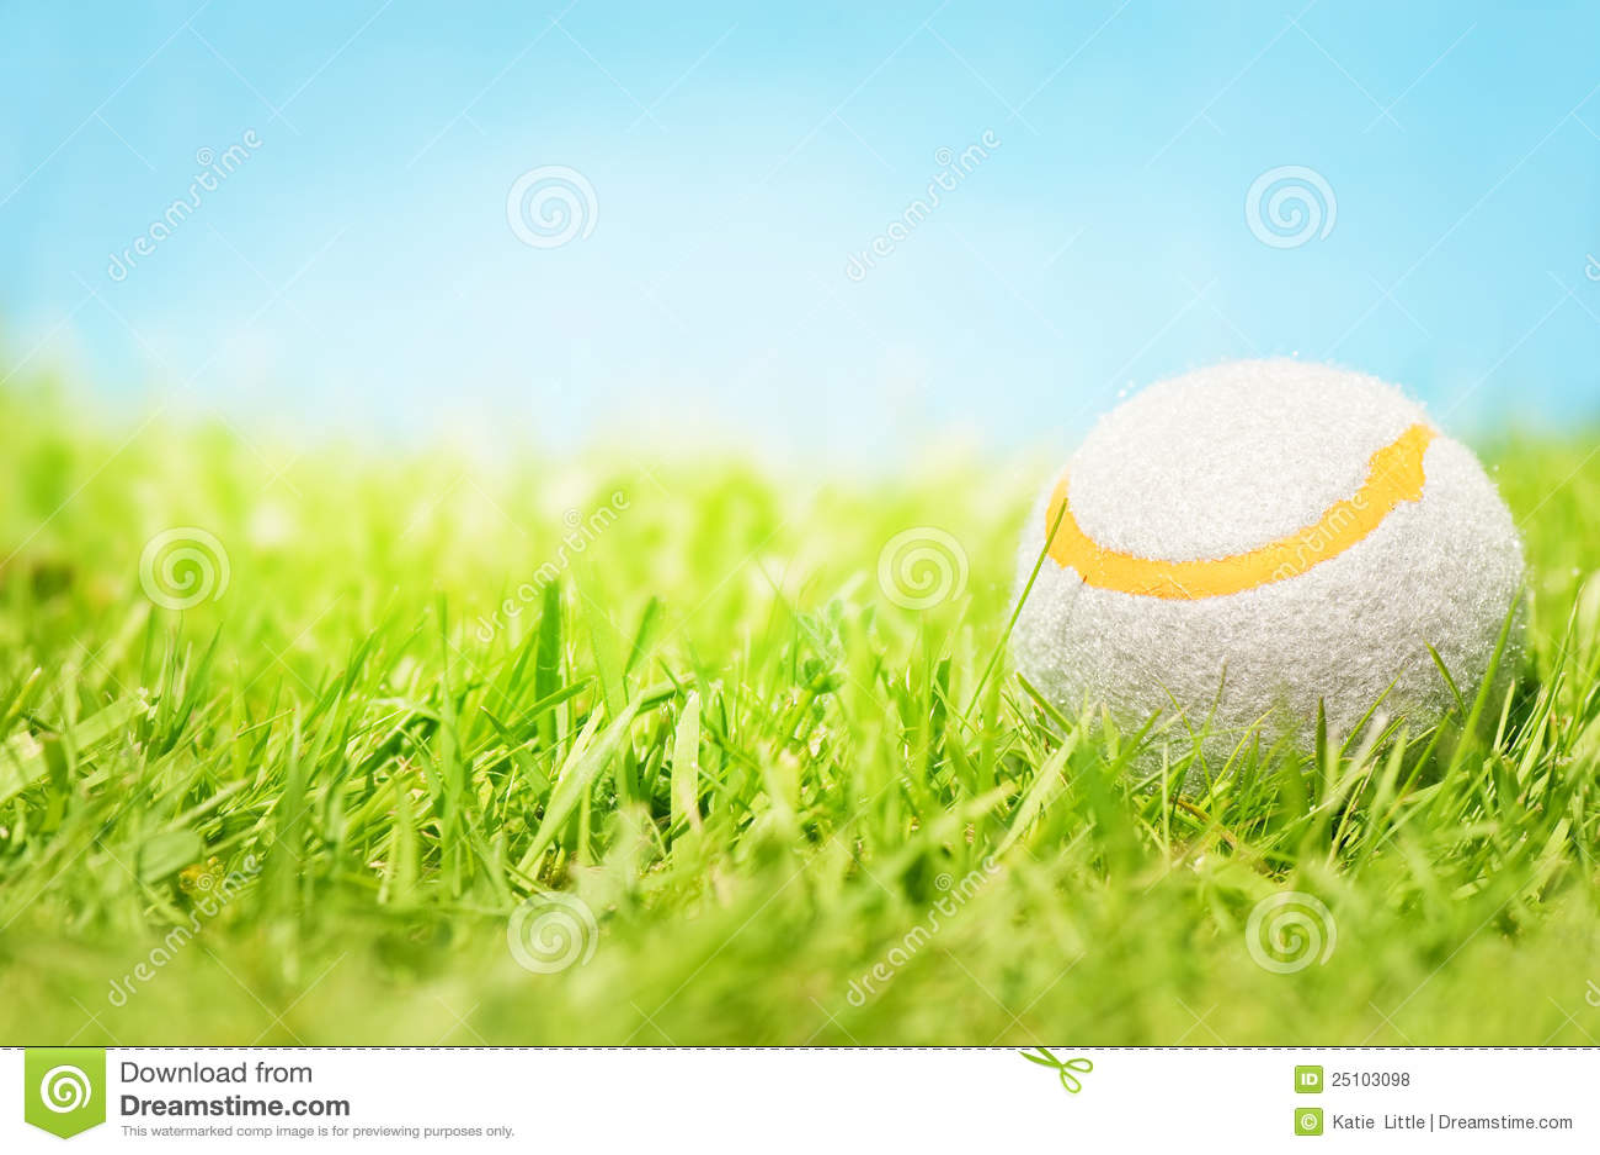 Pelota de tenis en hierba